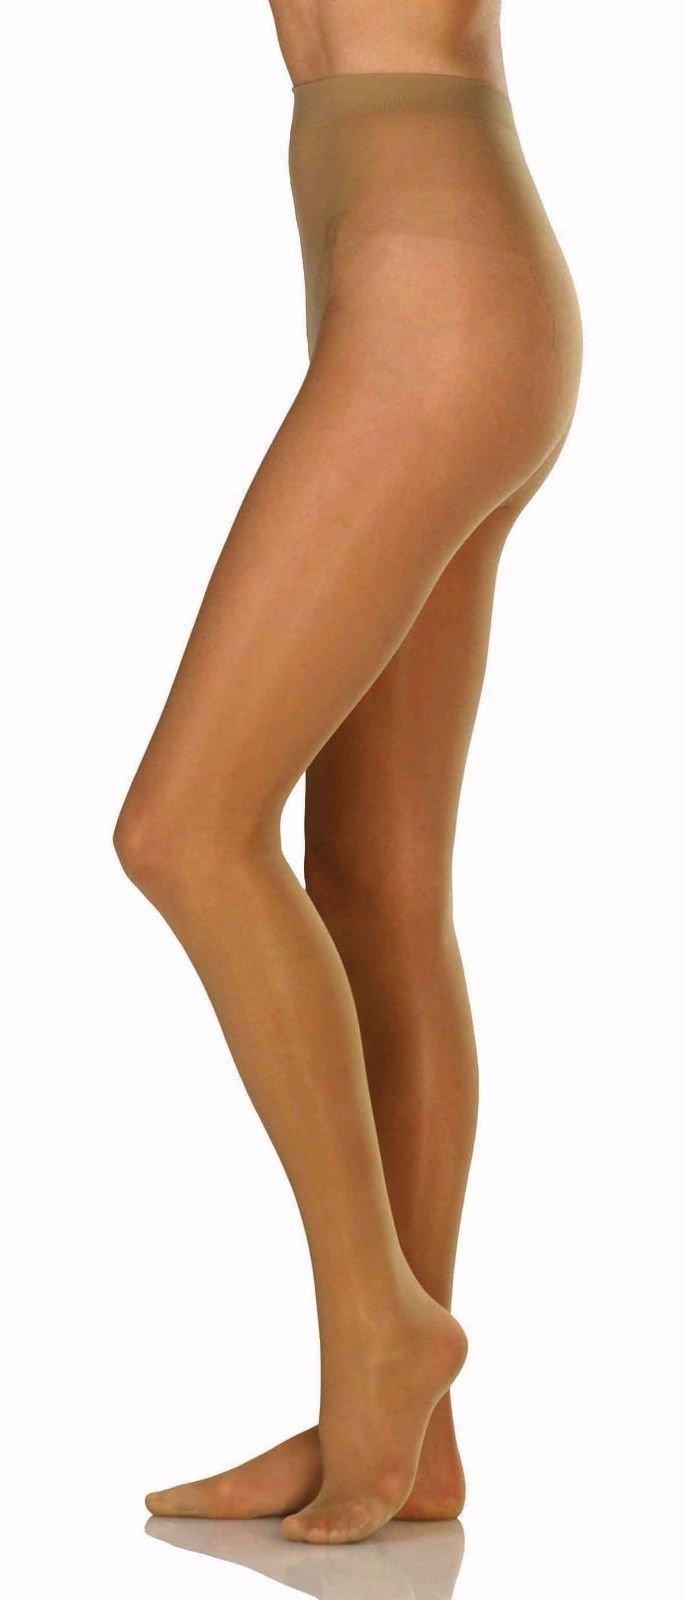 Jobst Ultrasheer 20-30 Waist High Closed Toe Pantyhose Stocking Suntan Small by JOBST